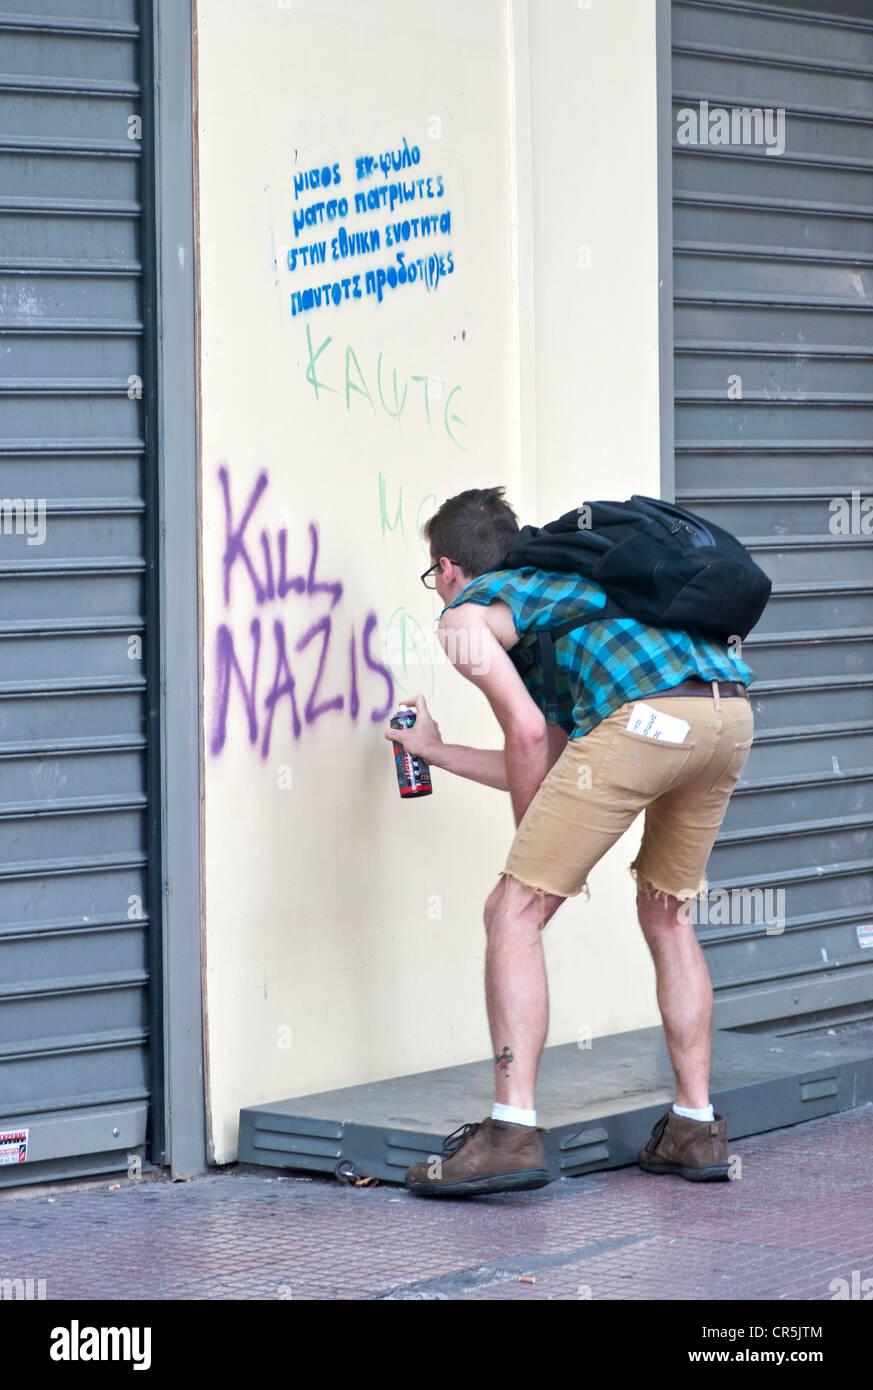 Anti nazi graffiti. Guy writing with spray on the wall ' Kill nazis' - Stock Image